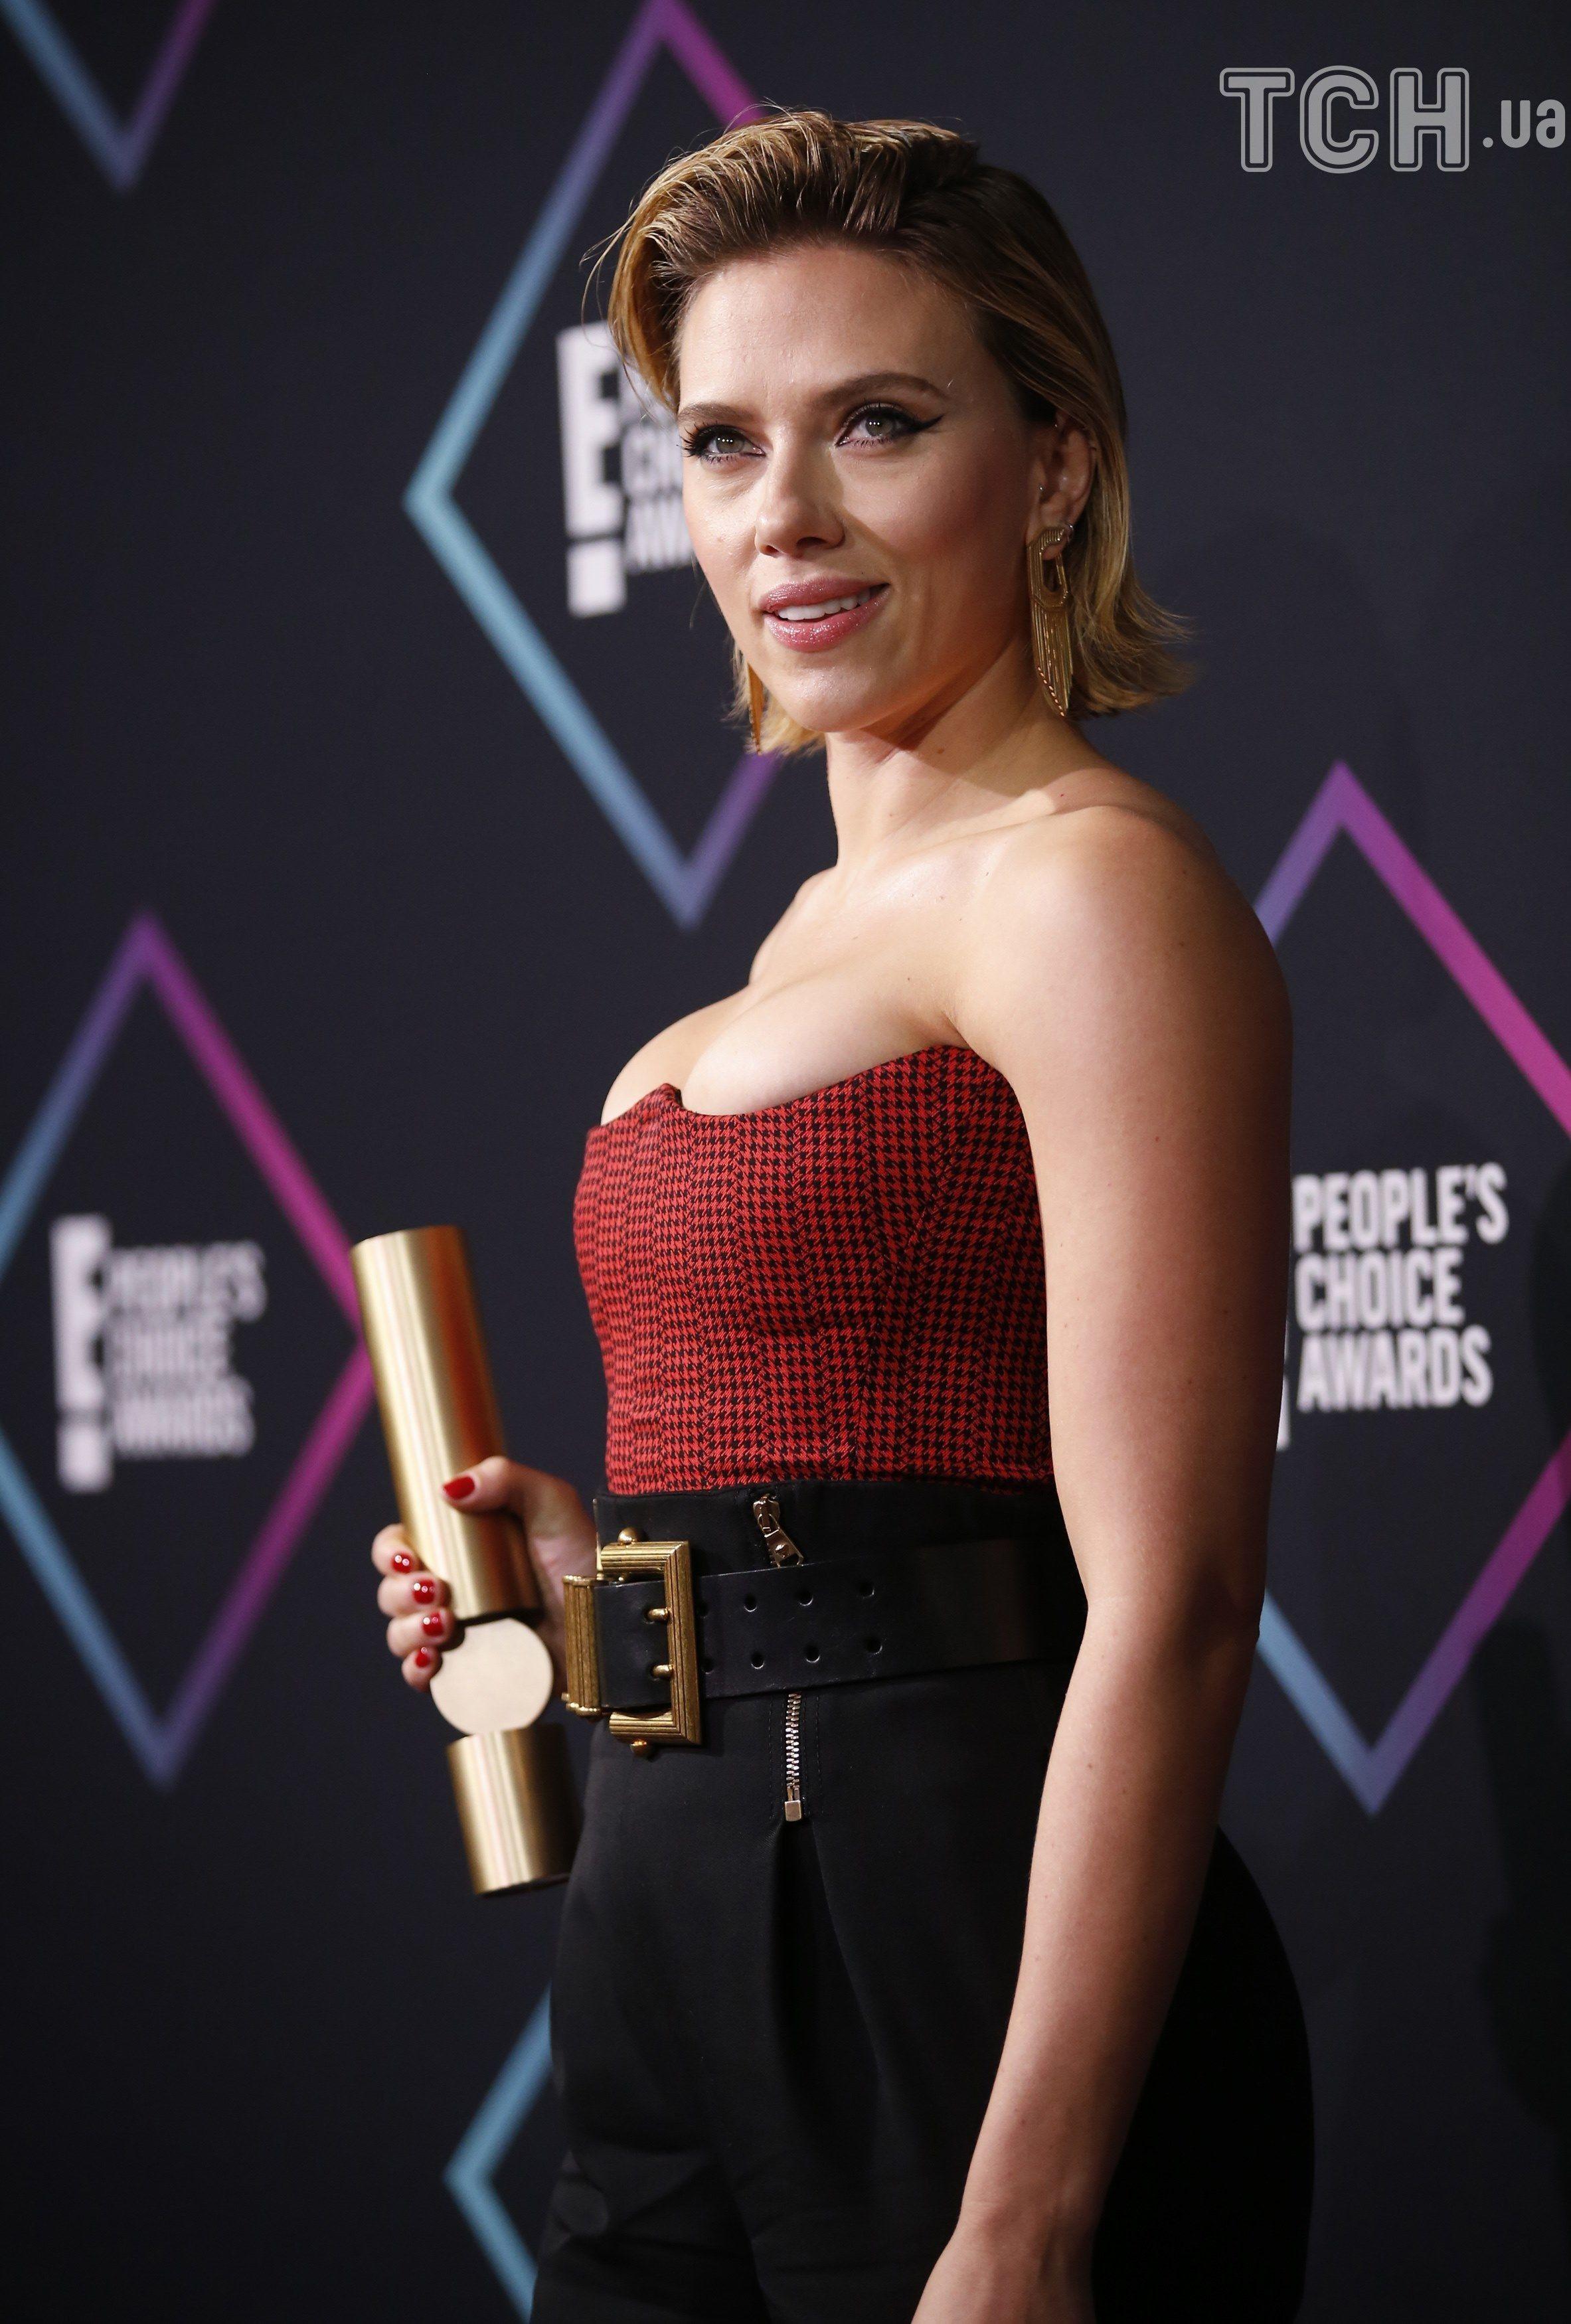 People's Choice Awards-2018_9